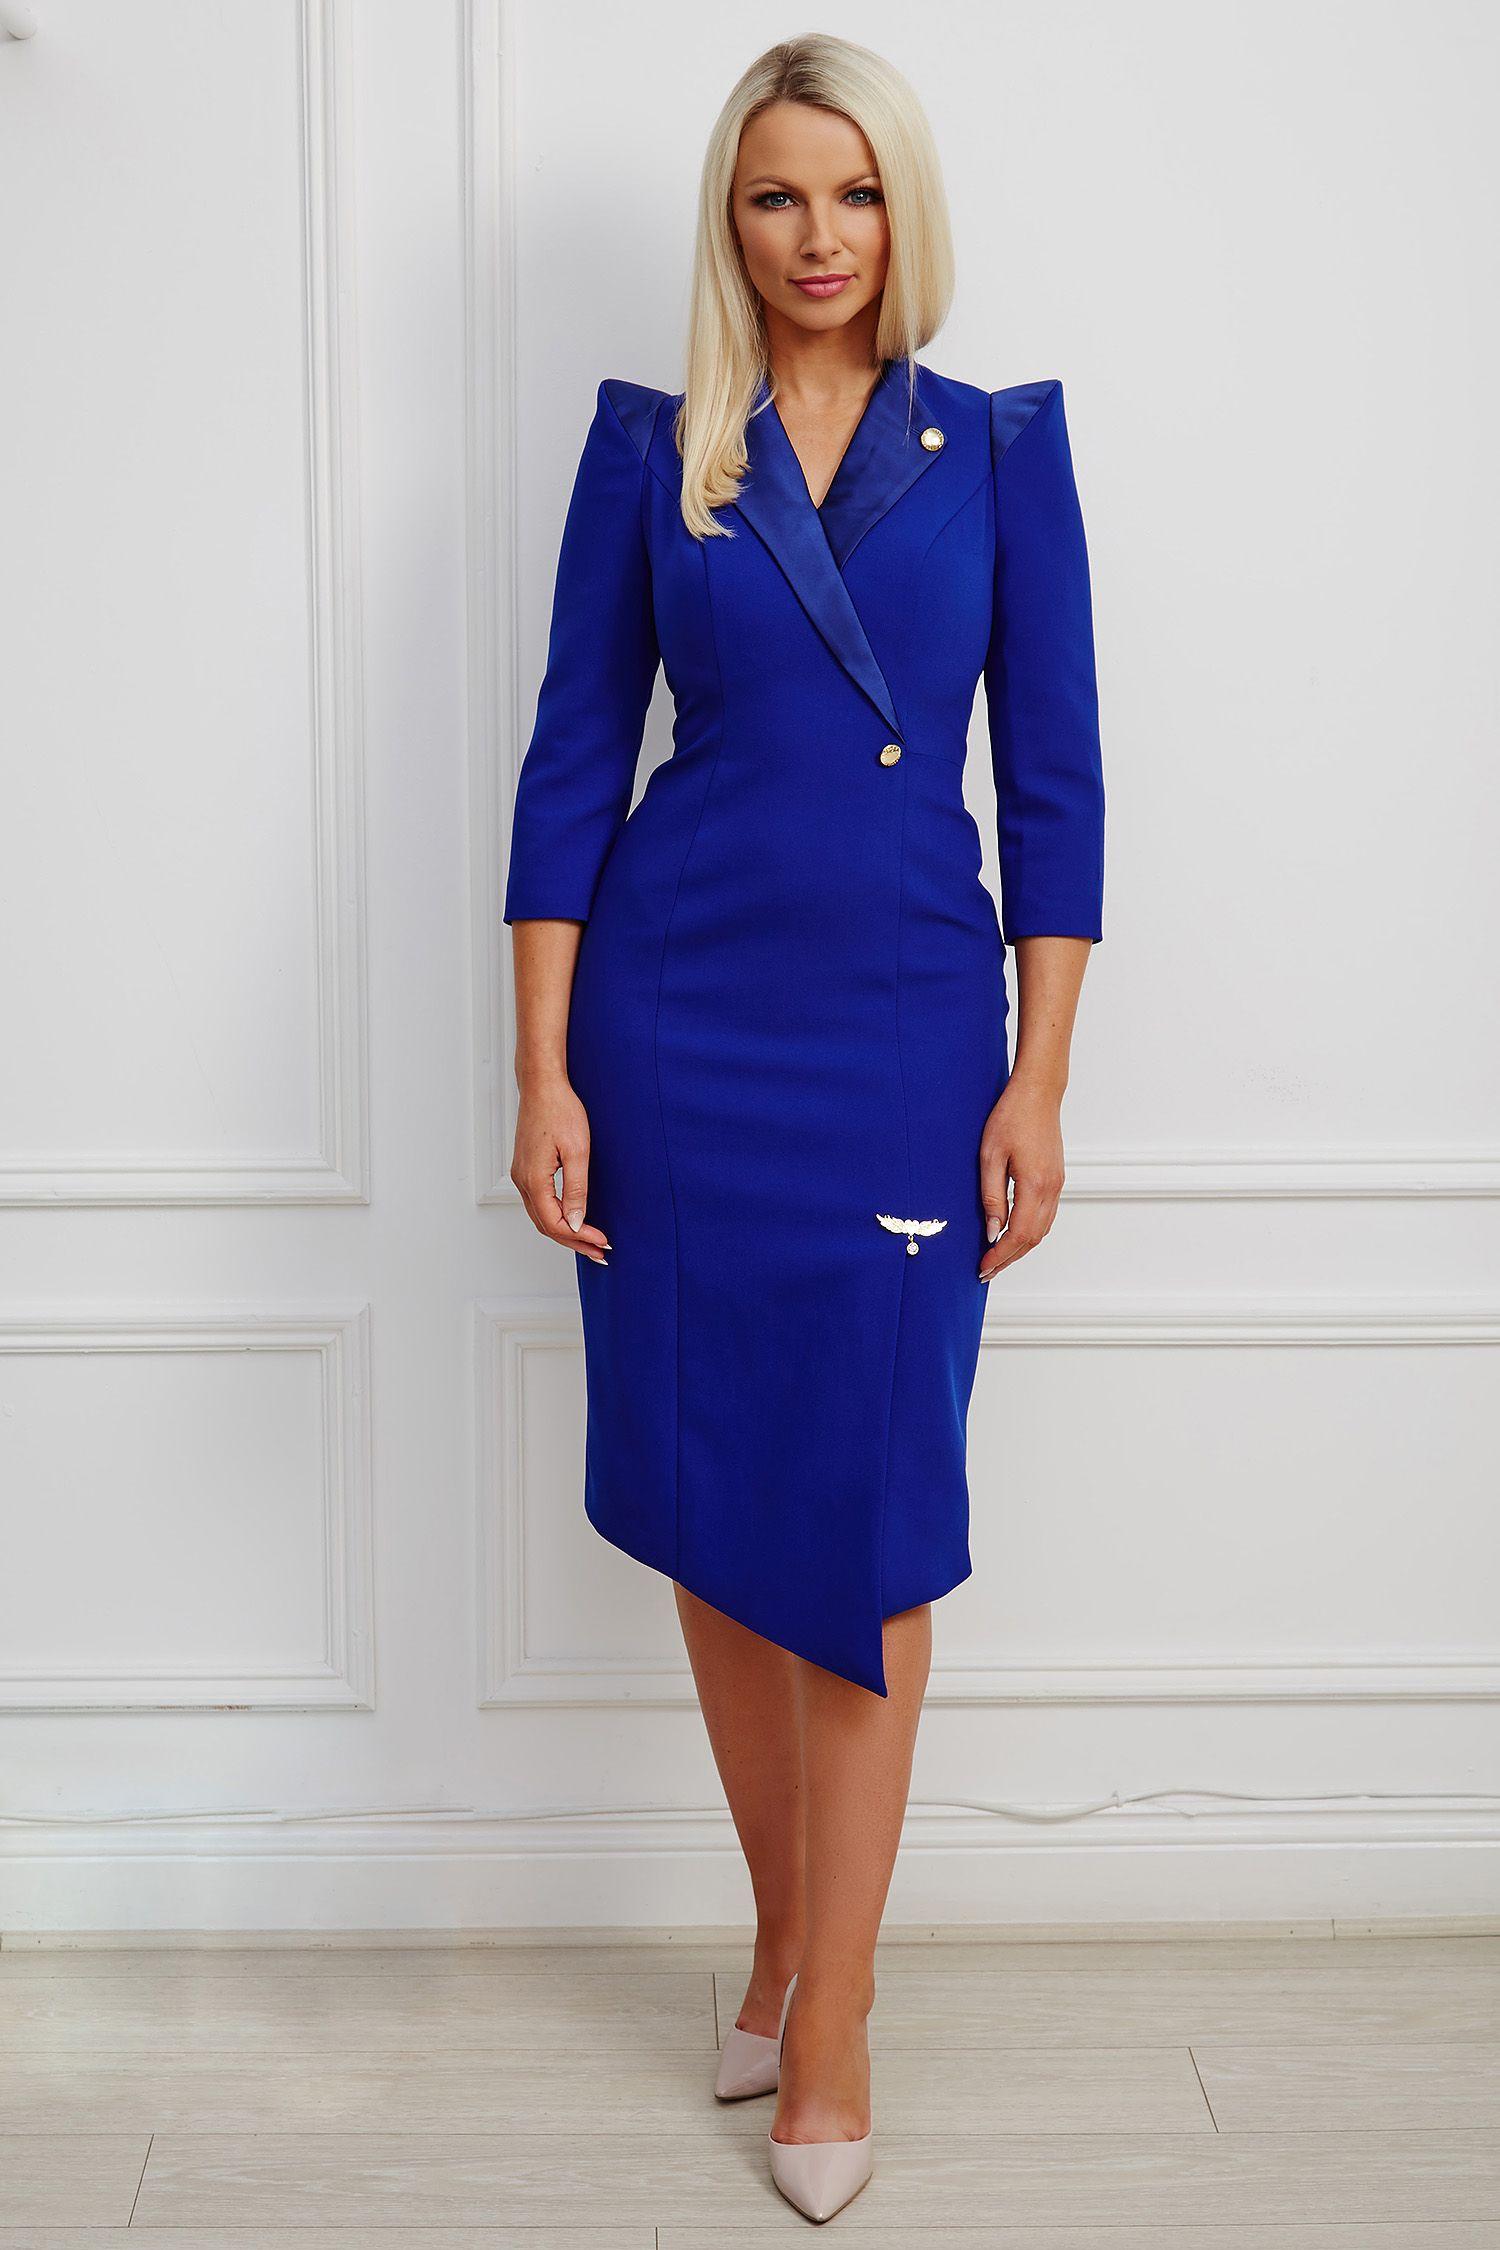 Cobalt blue tuxedo dress with pointed shoulder and asymmetric hem